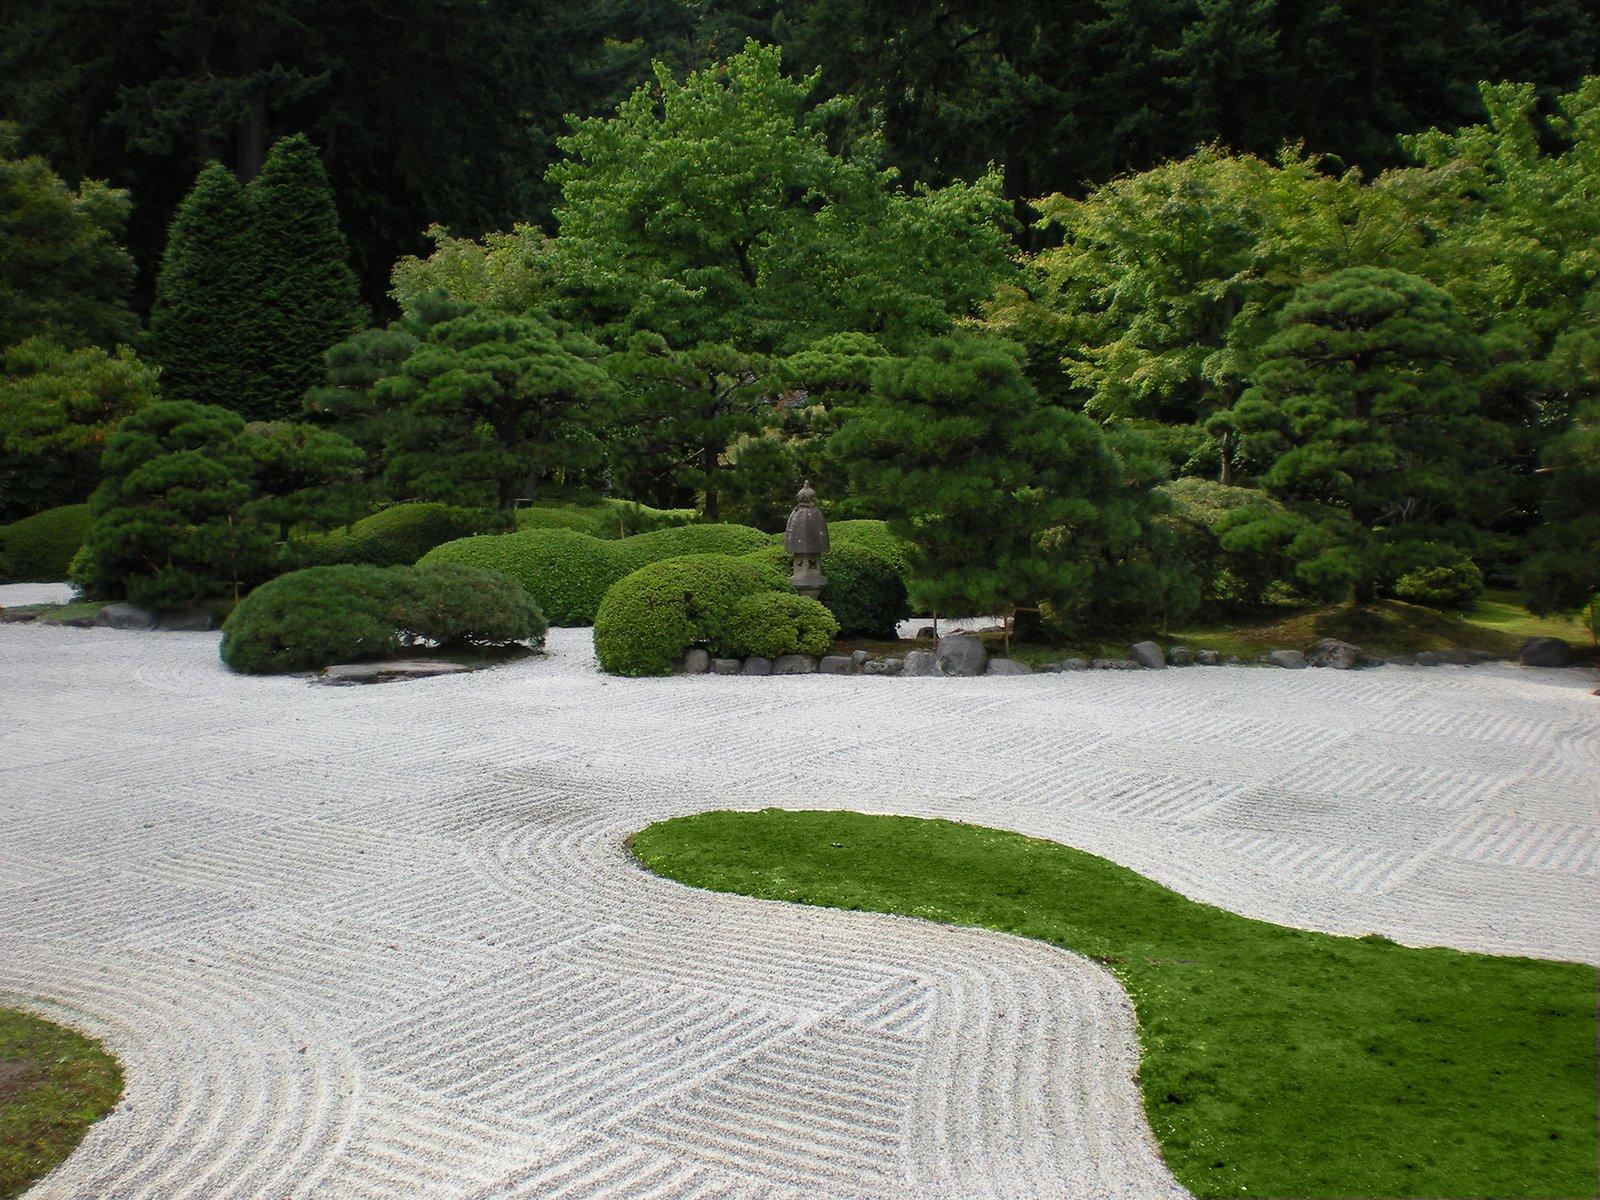 Free Zen Garden Stock Photo - FreeImages.com